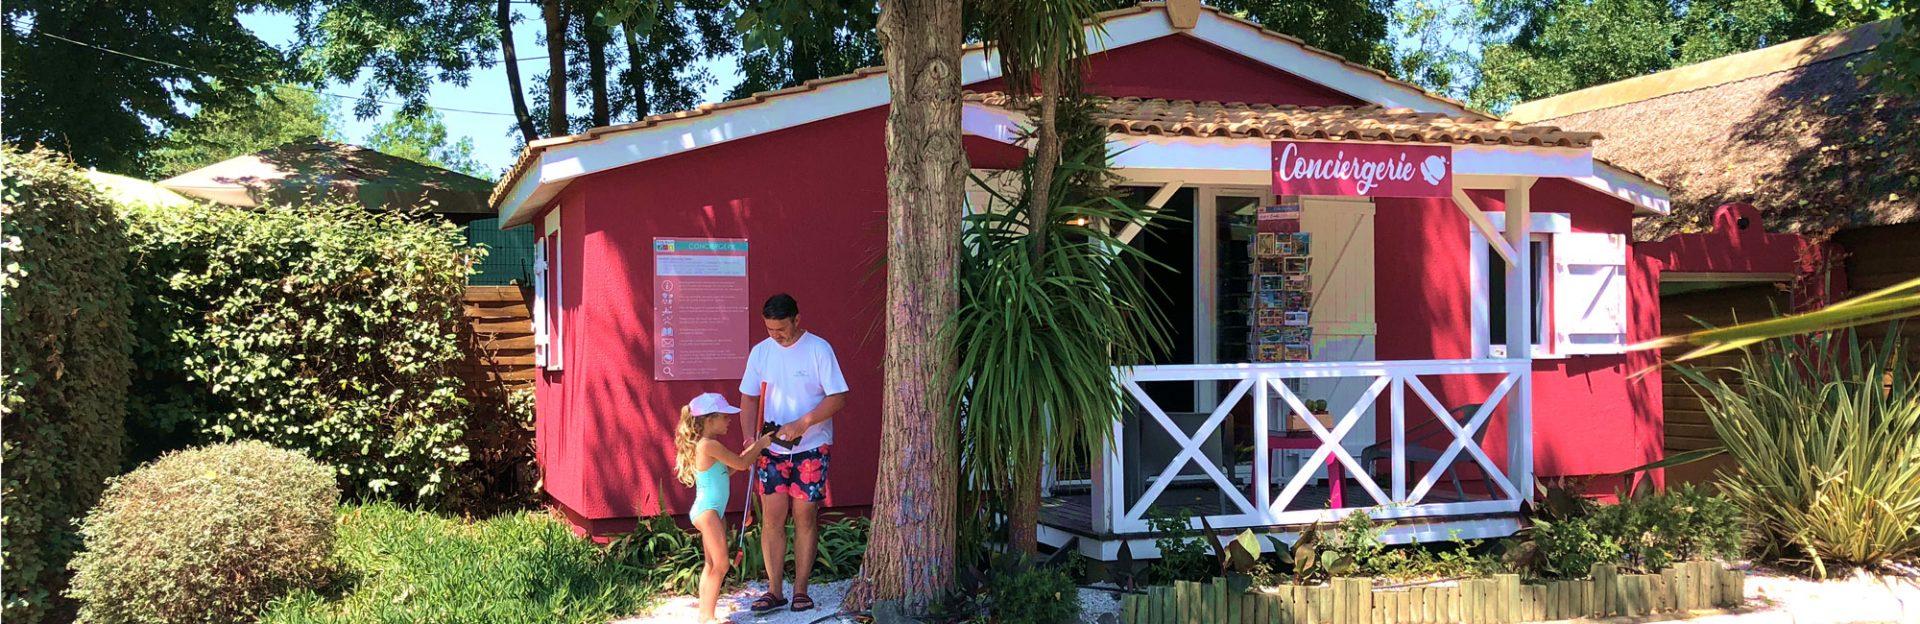 Camping L'air Marin : Conciergerie